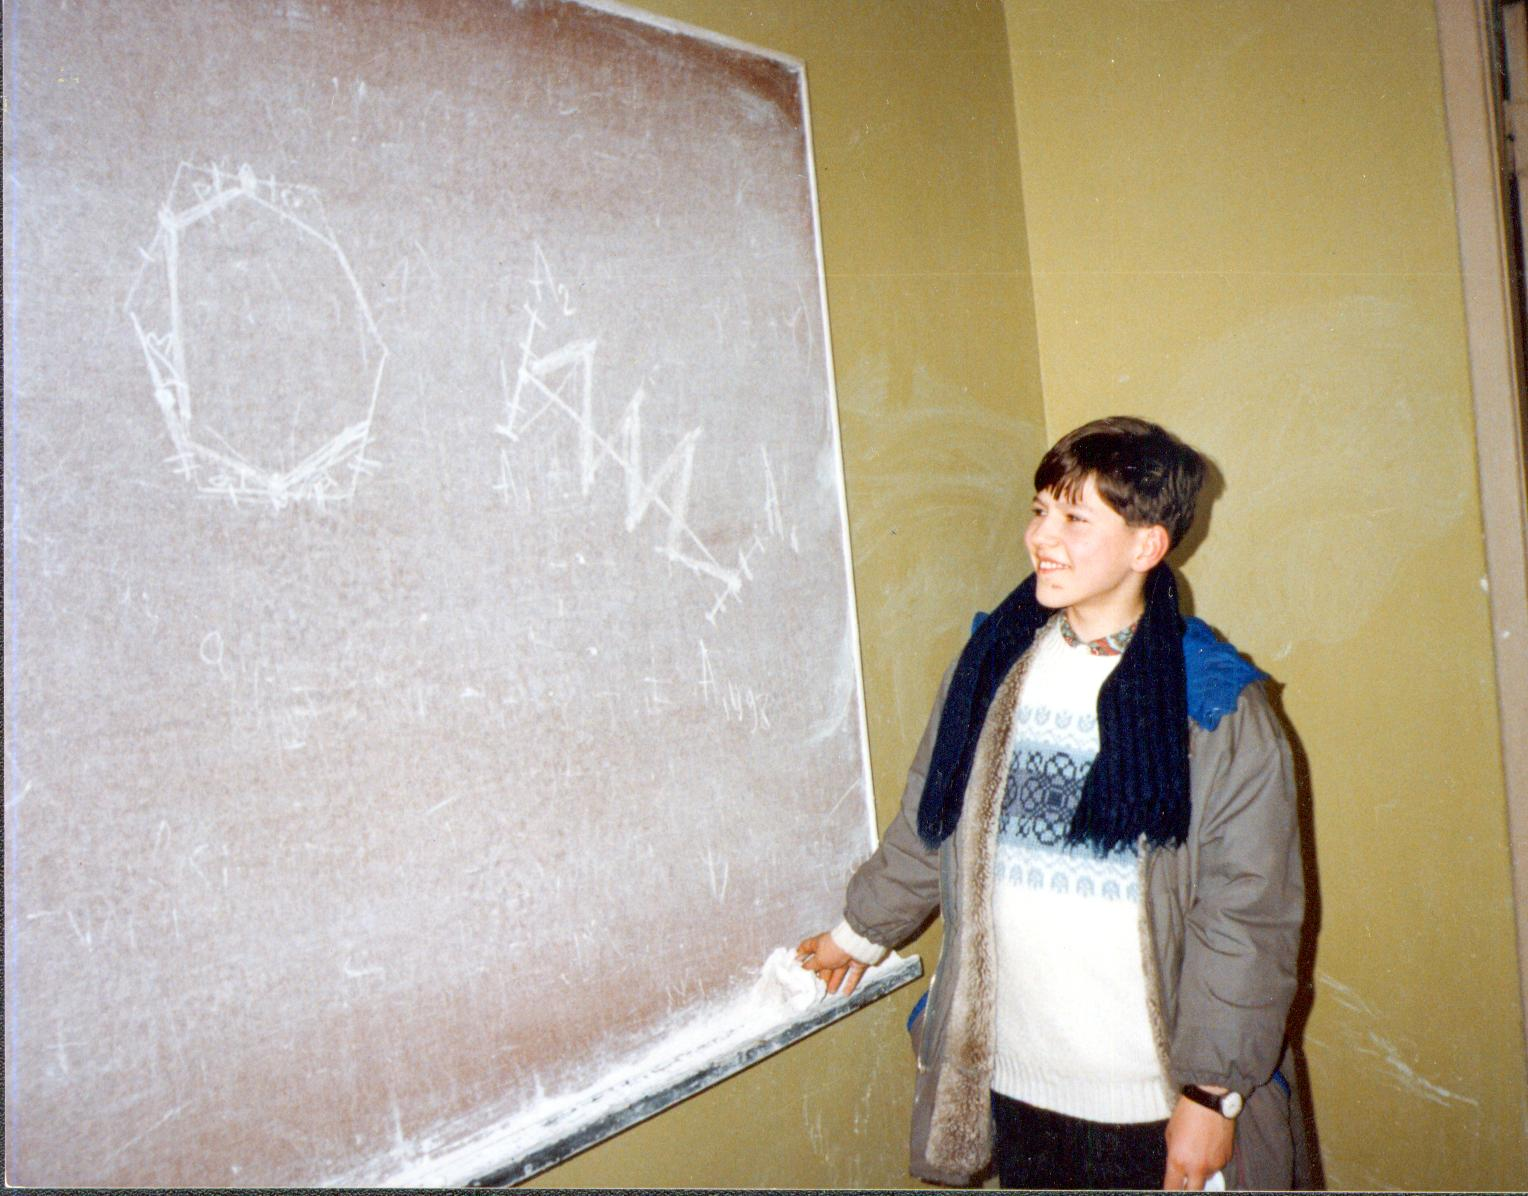 Евгений Сергеев в 9 классе на олимпиаде по математике/ Фото из личного архива